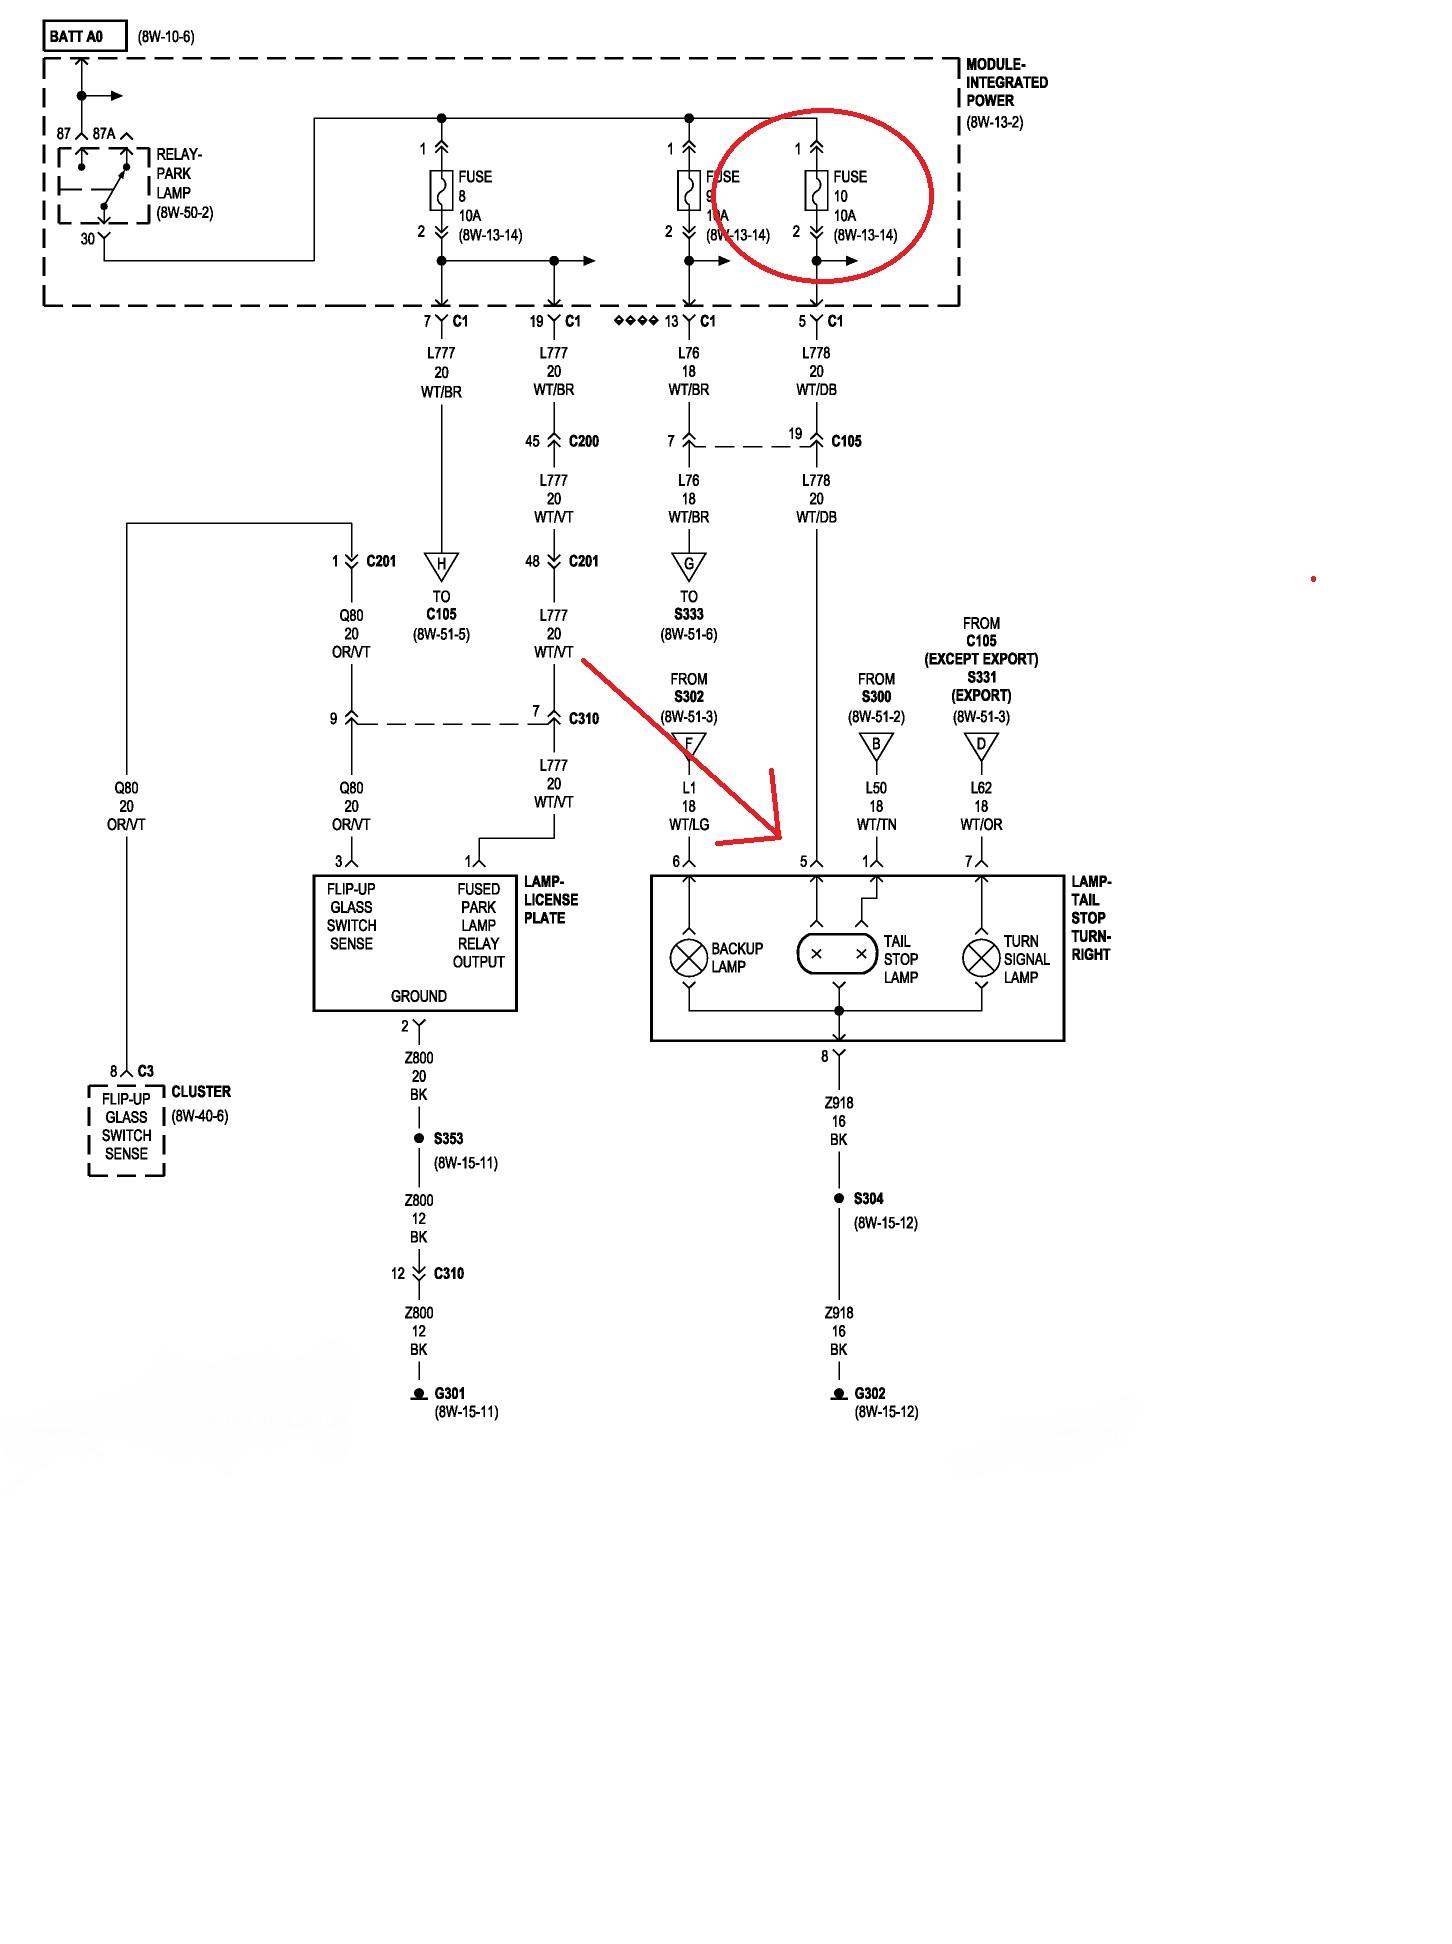 hight resolution of 2006 jeep wrangler wiring diagram free wiring diagram 2006 jeep wrangler wiring diagram jeep grand cherokee